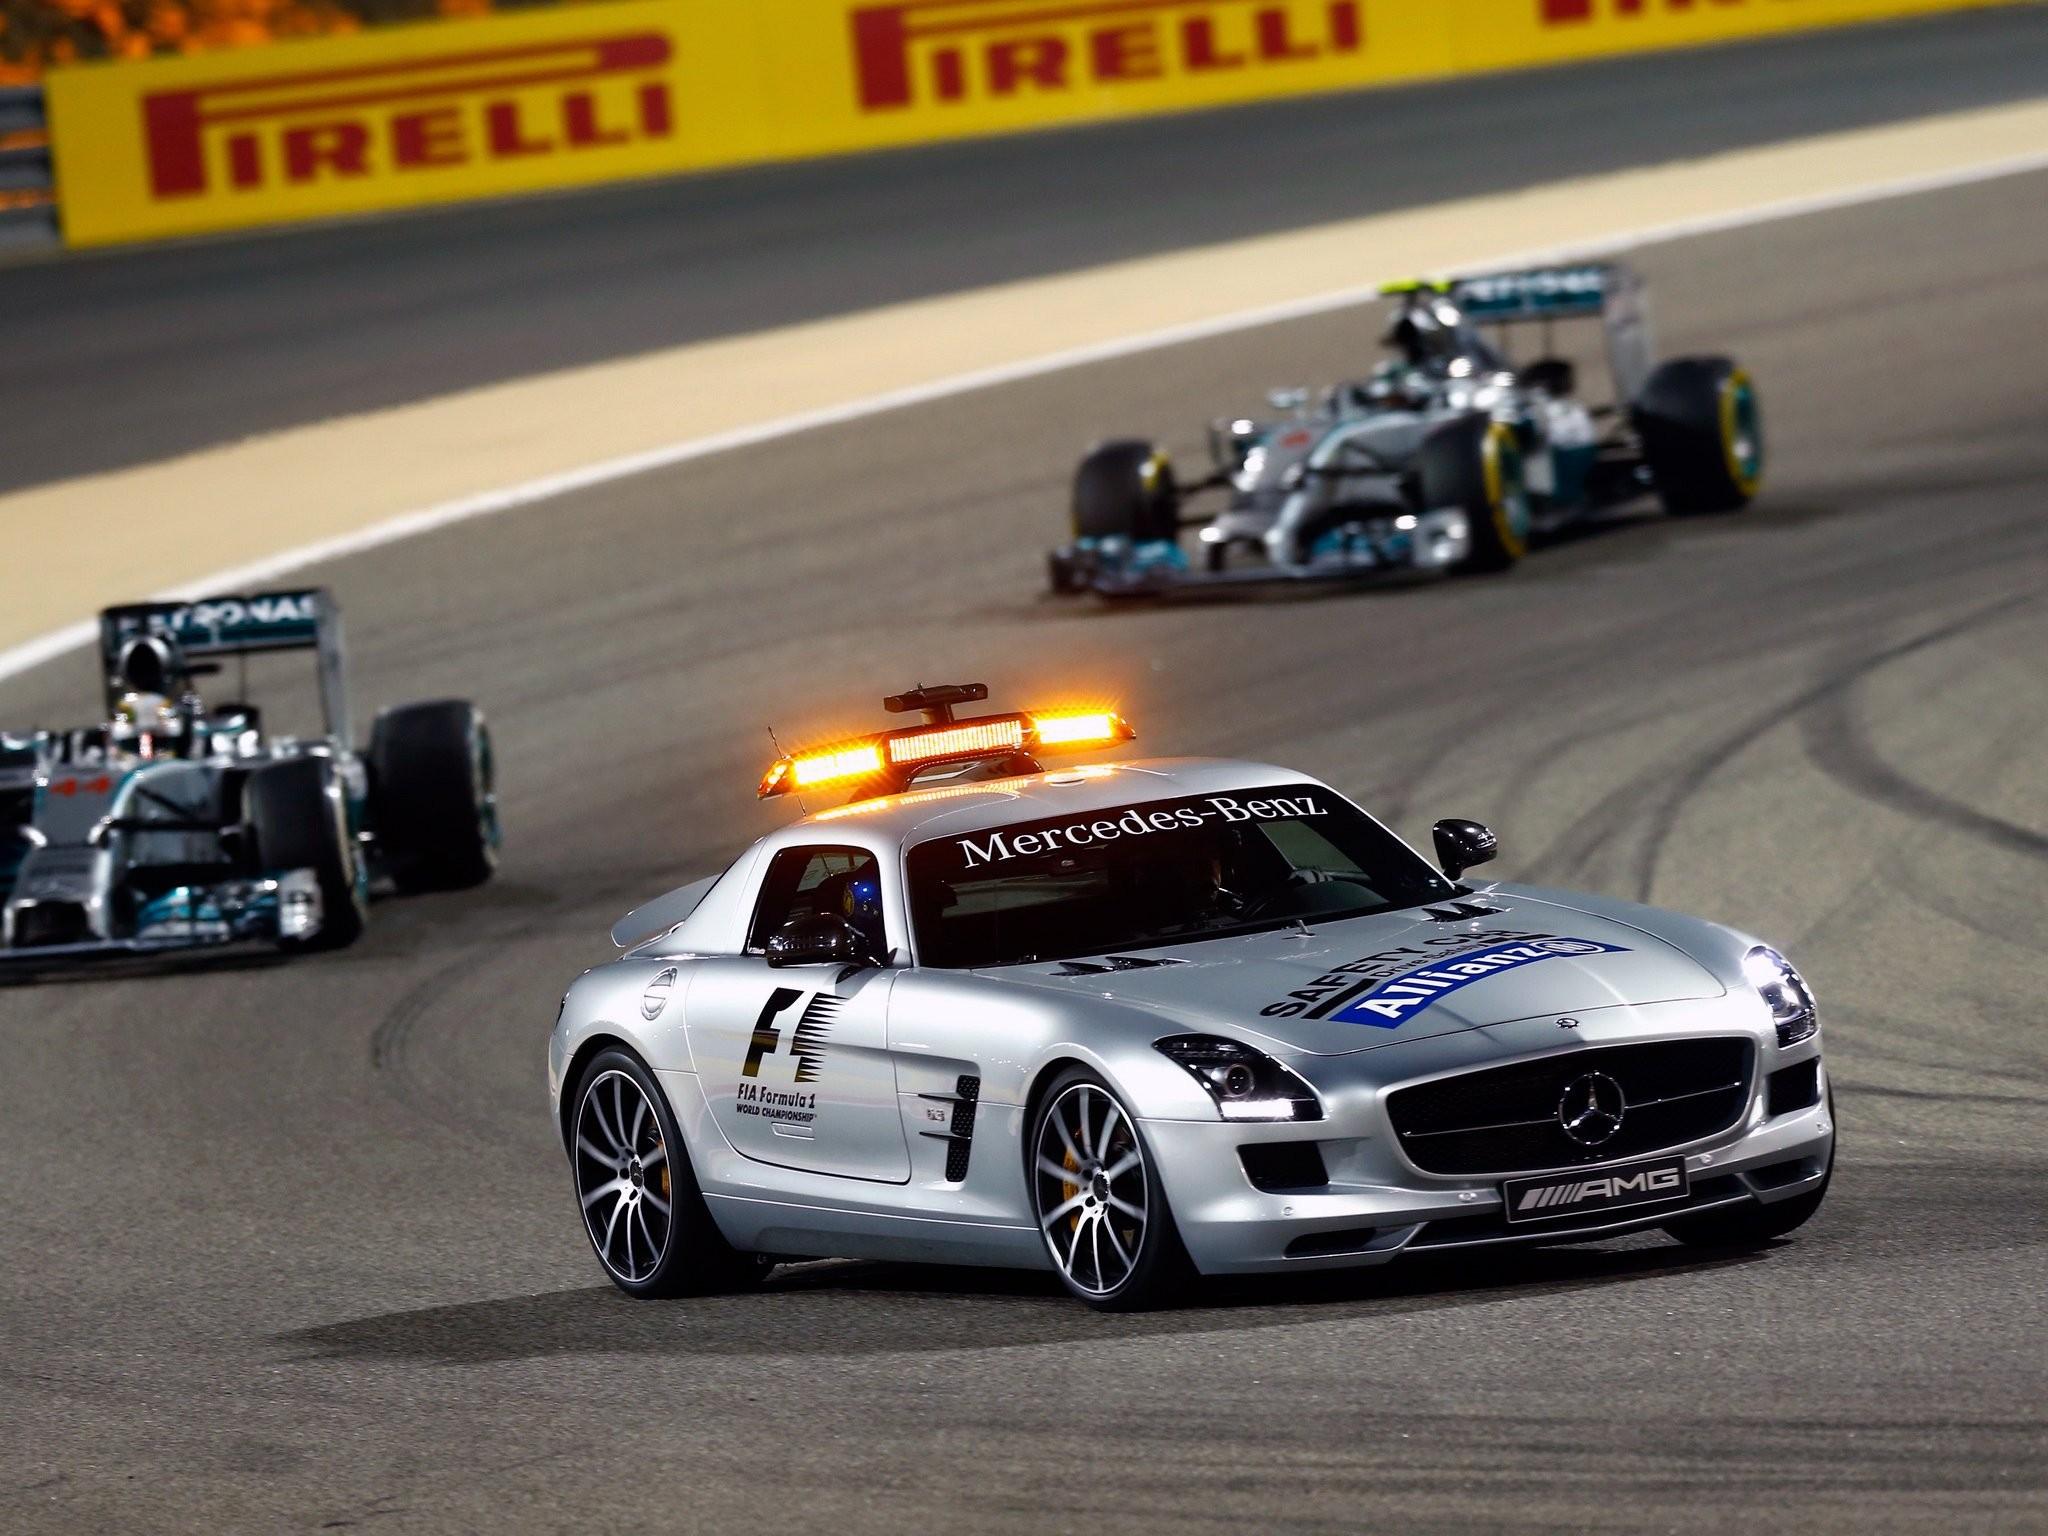 Wallpaper : 2048x1536 px, Bahrain, Formula 1, Grand Prix ...